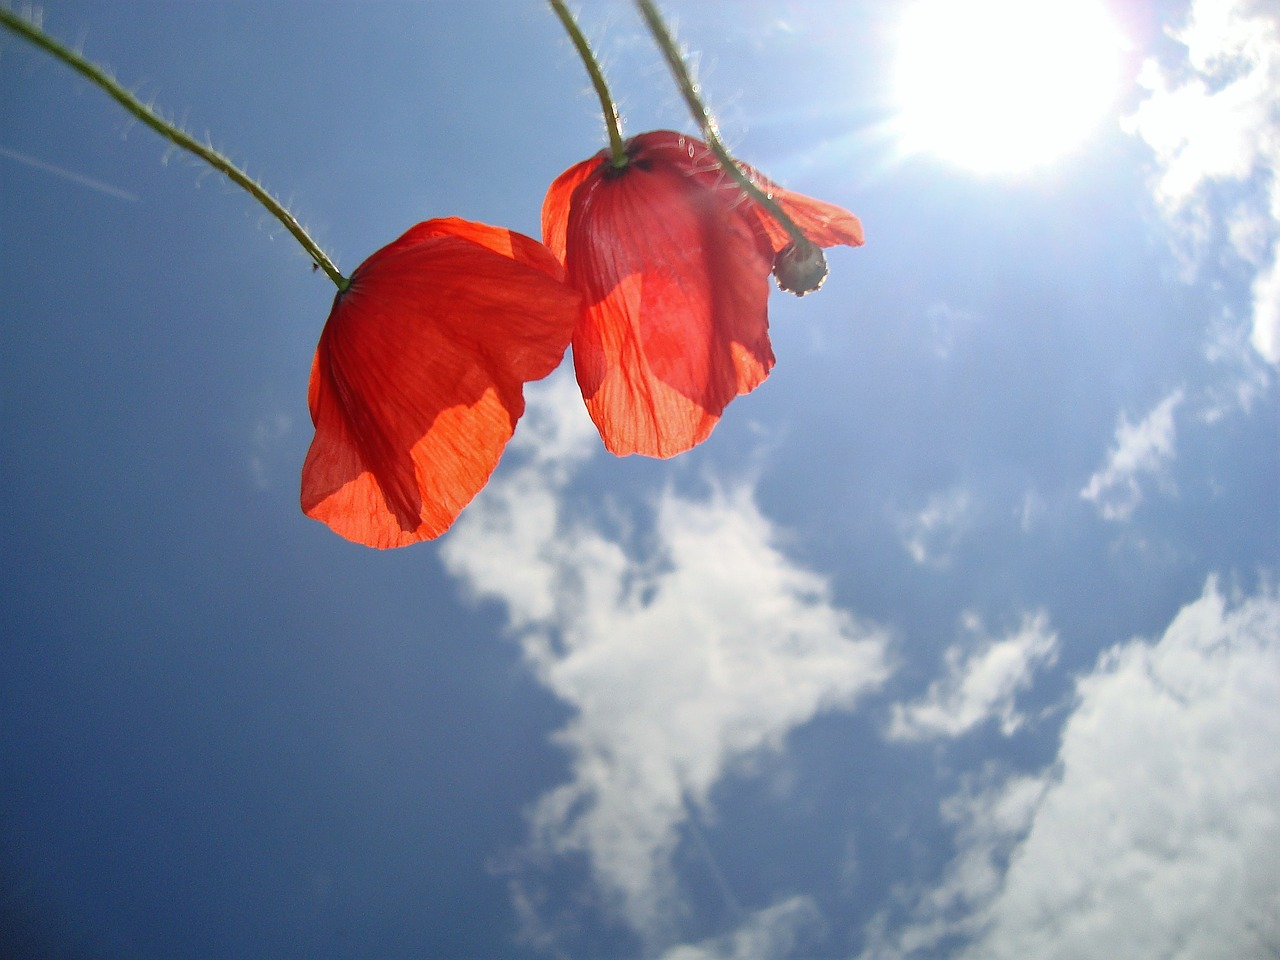 Poppiesflowersskyredplant Free Photo From Needpix